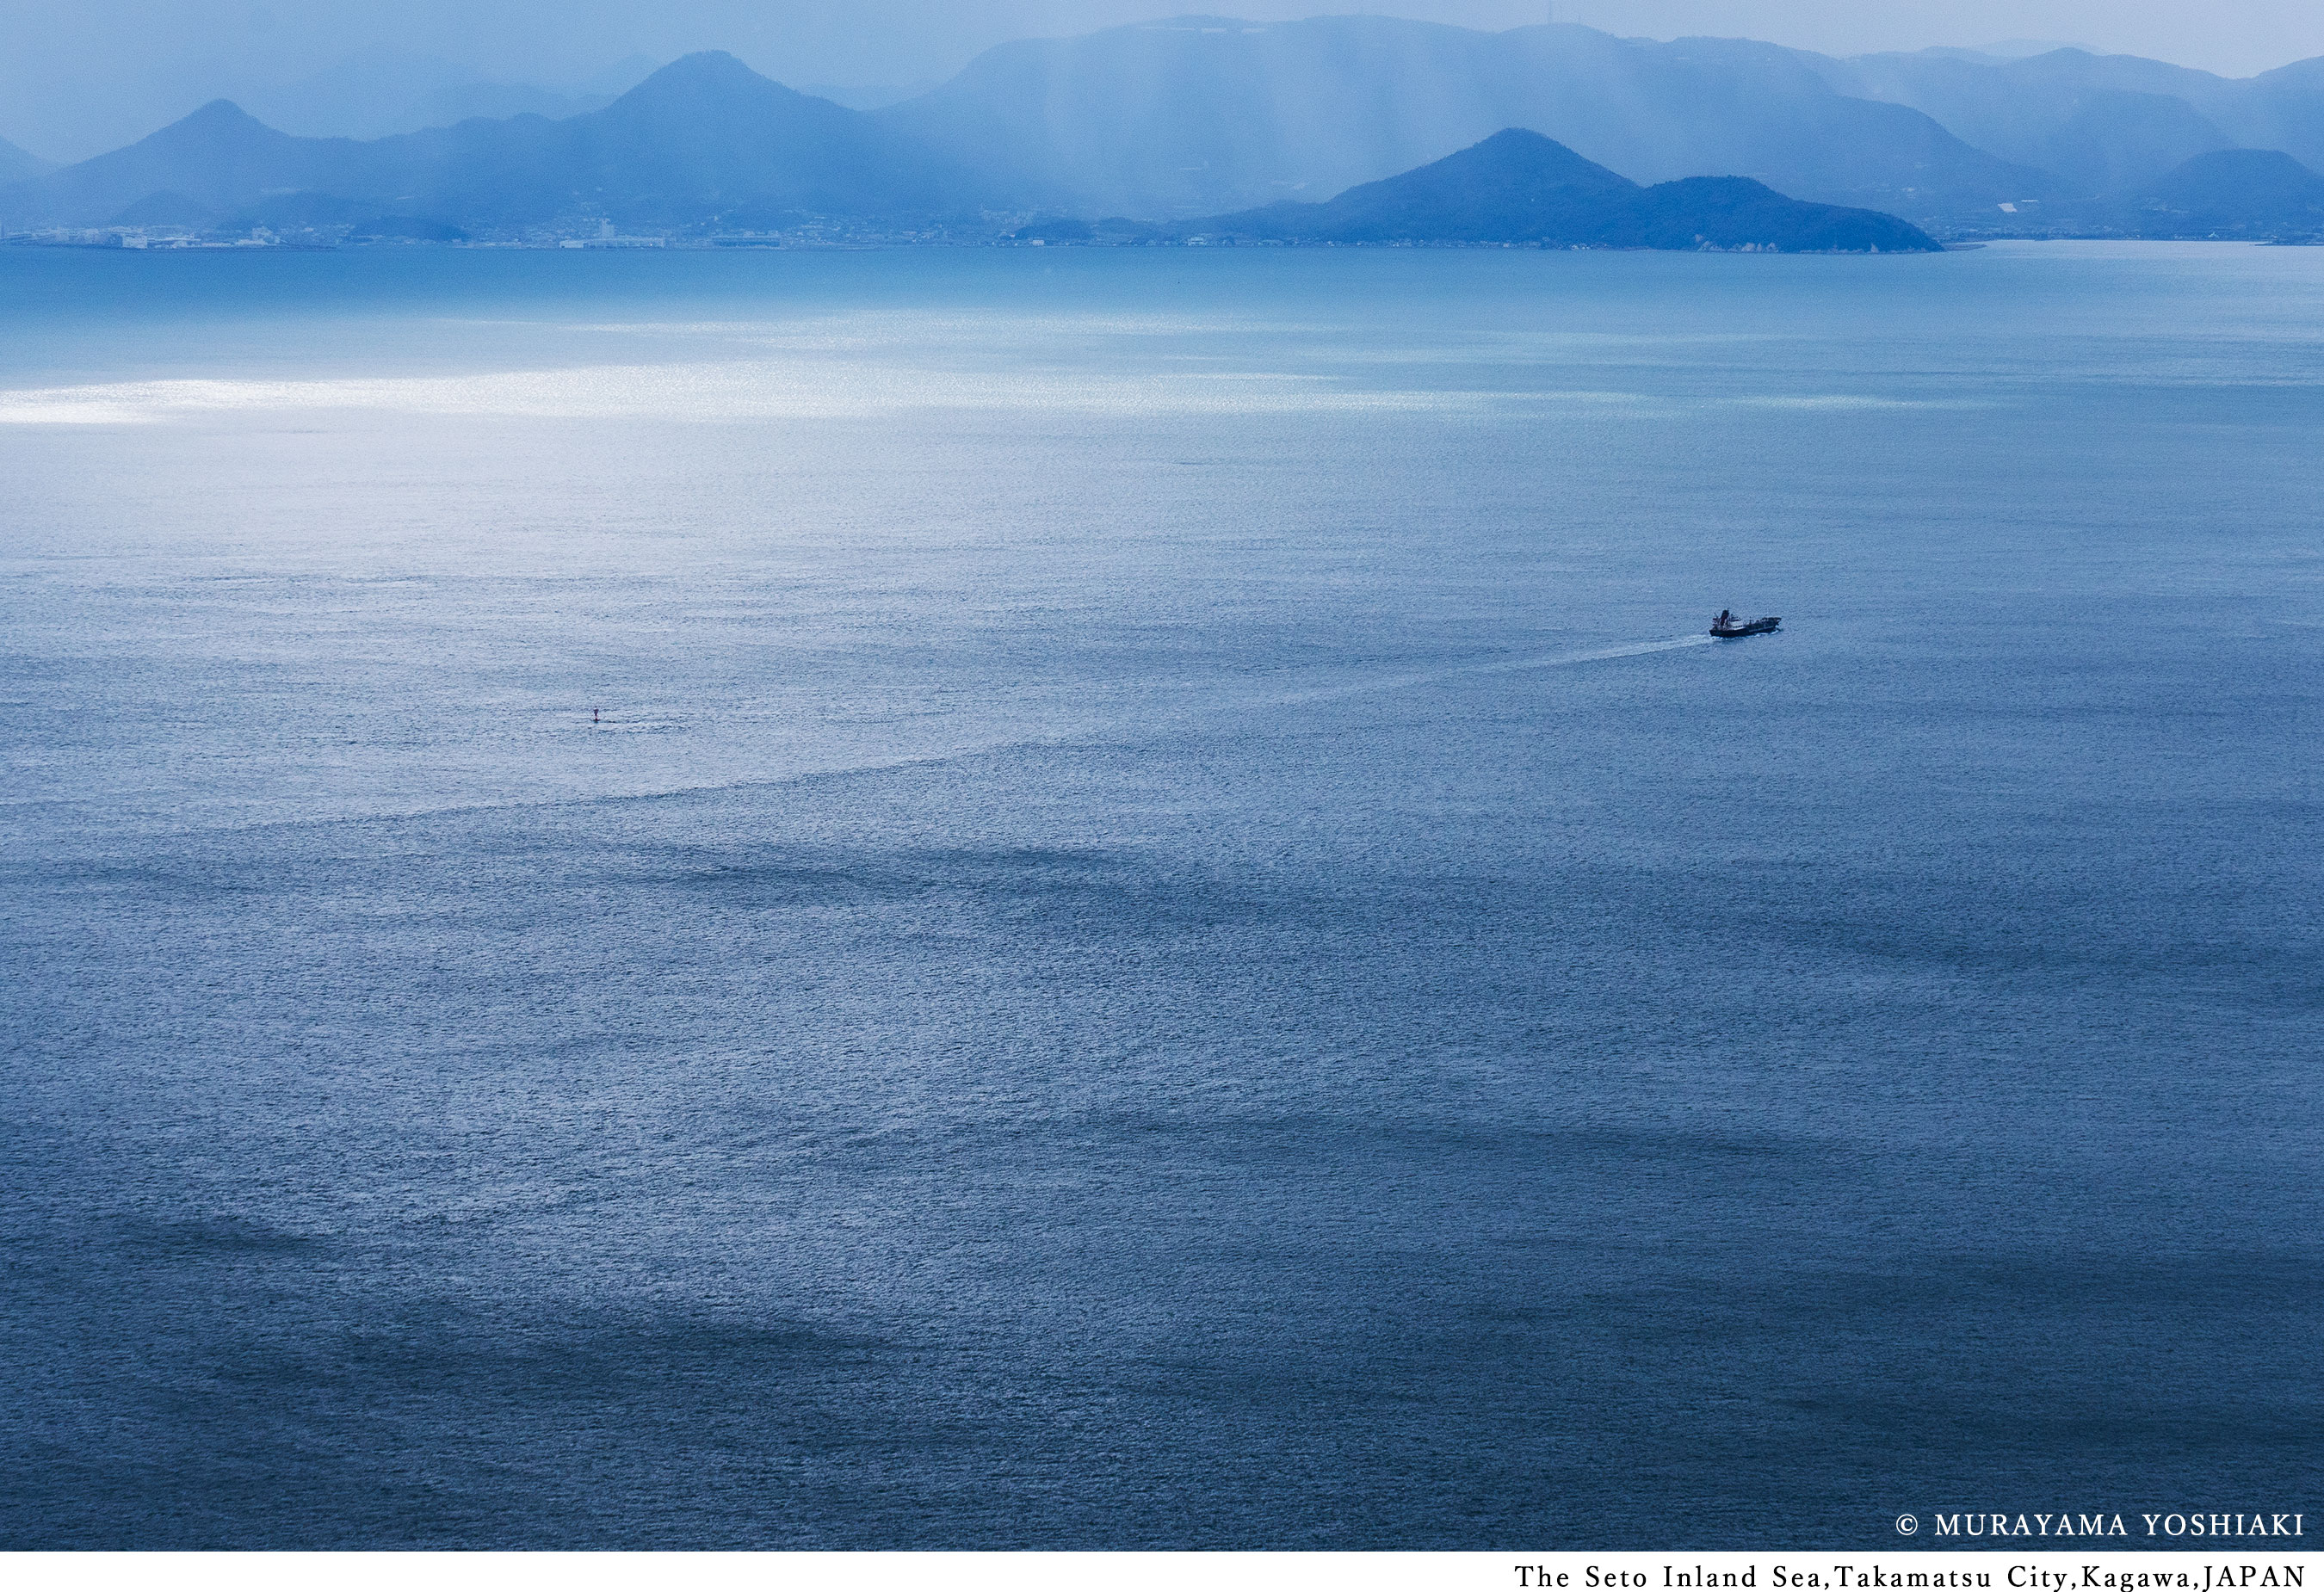 The Seto Inland Sea. Takamatsu City, Kagawa JAPAN.